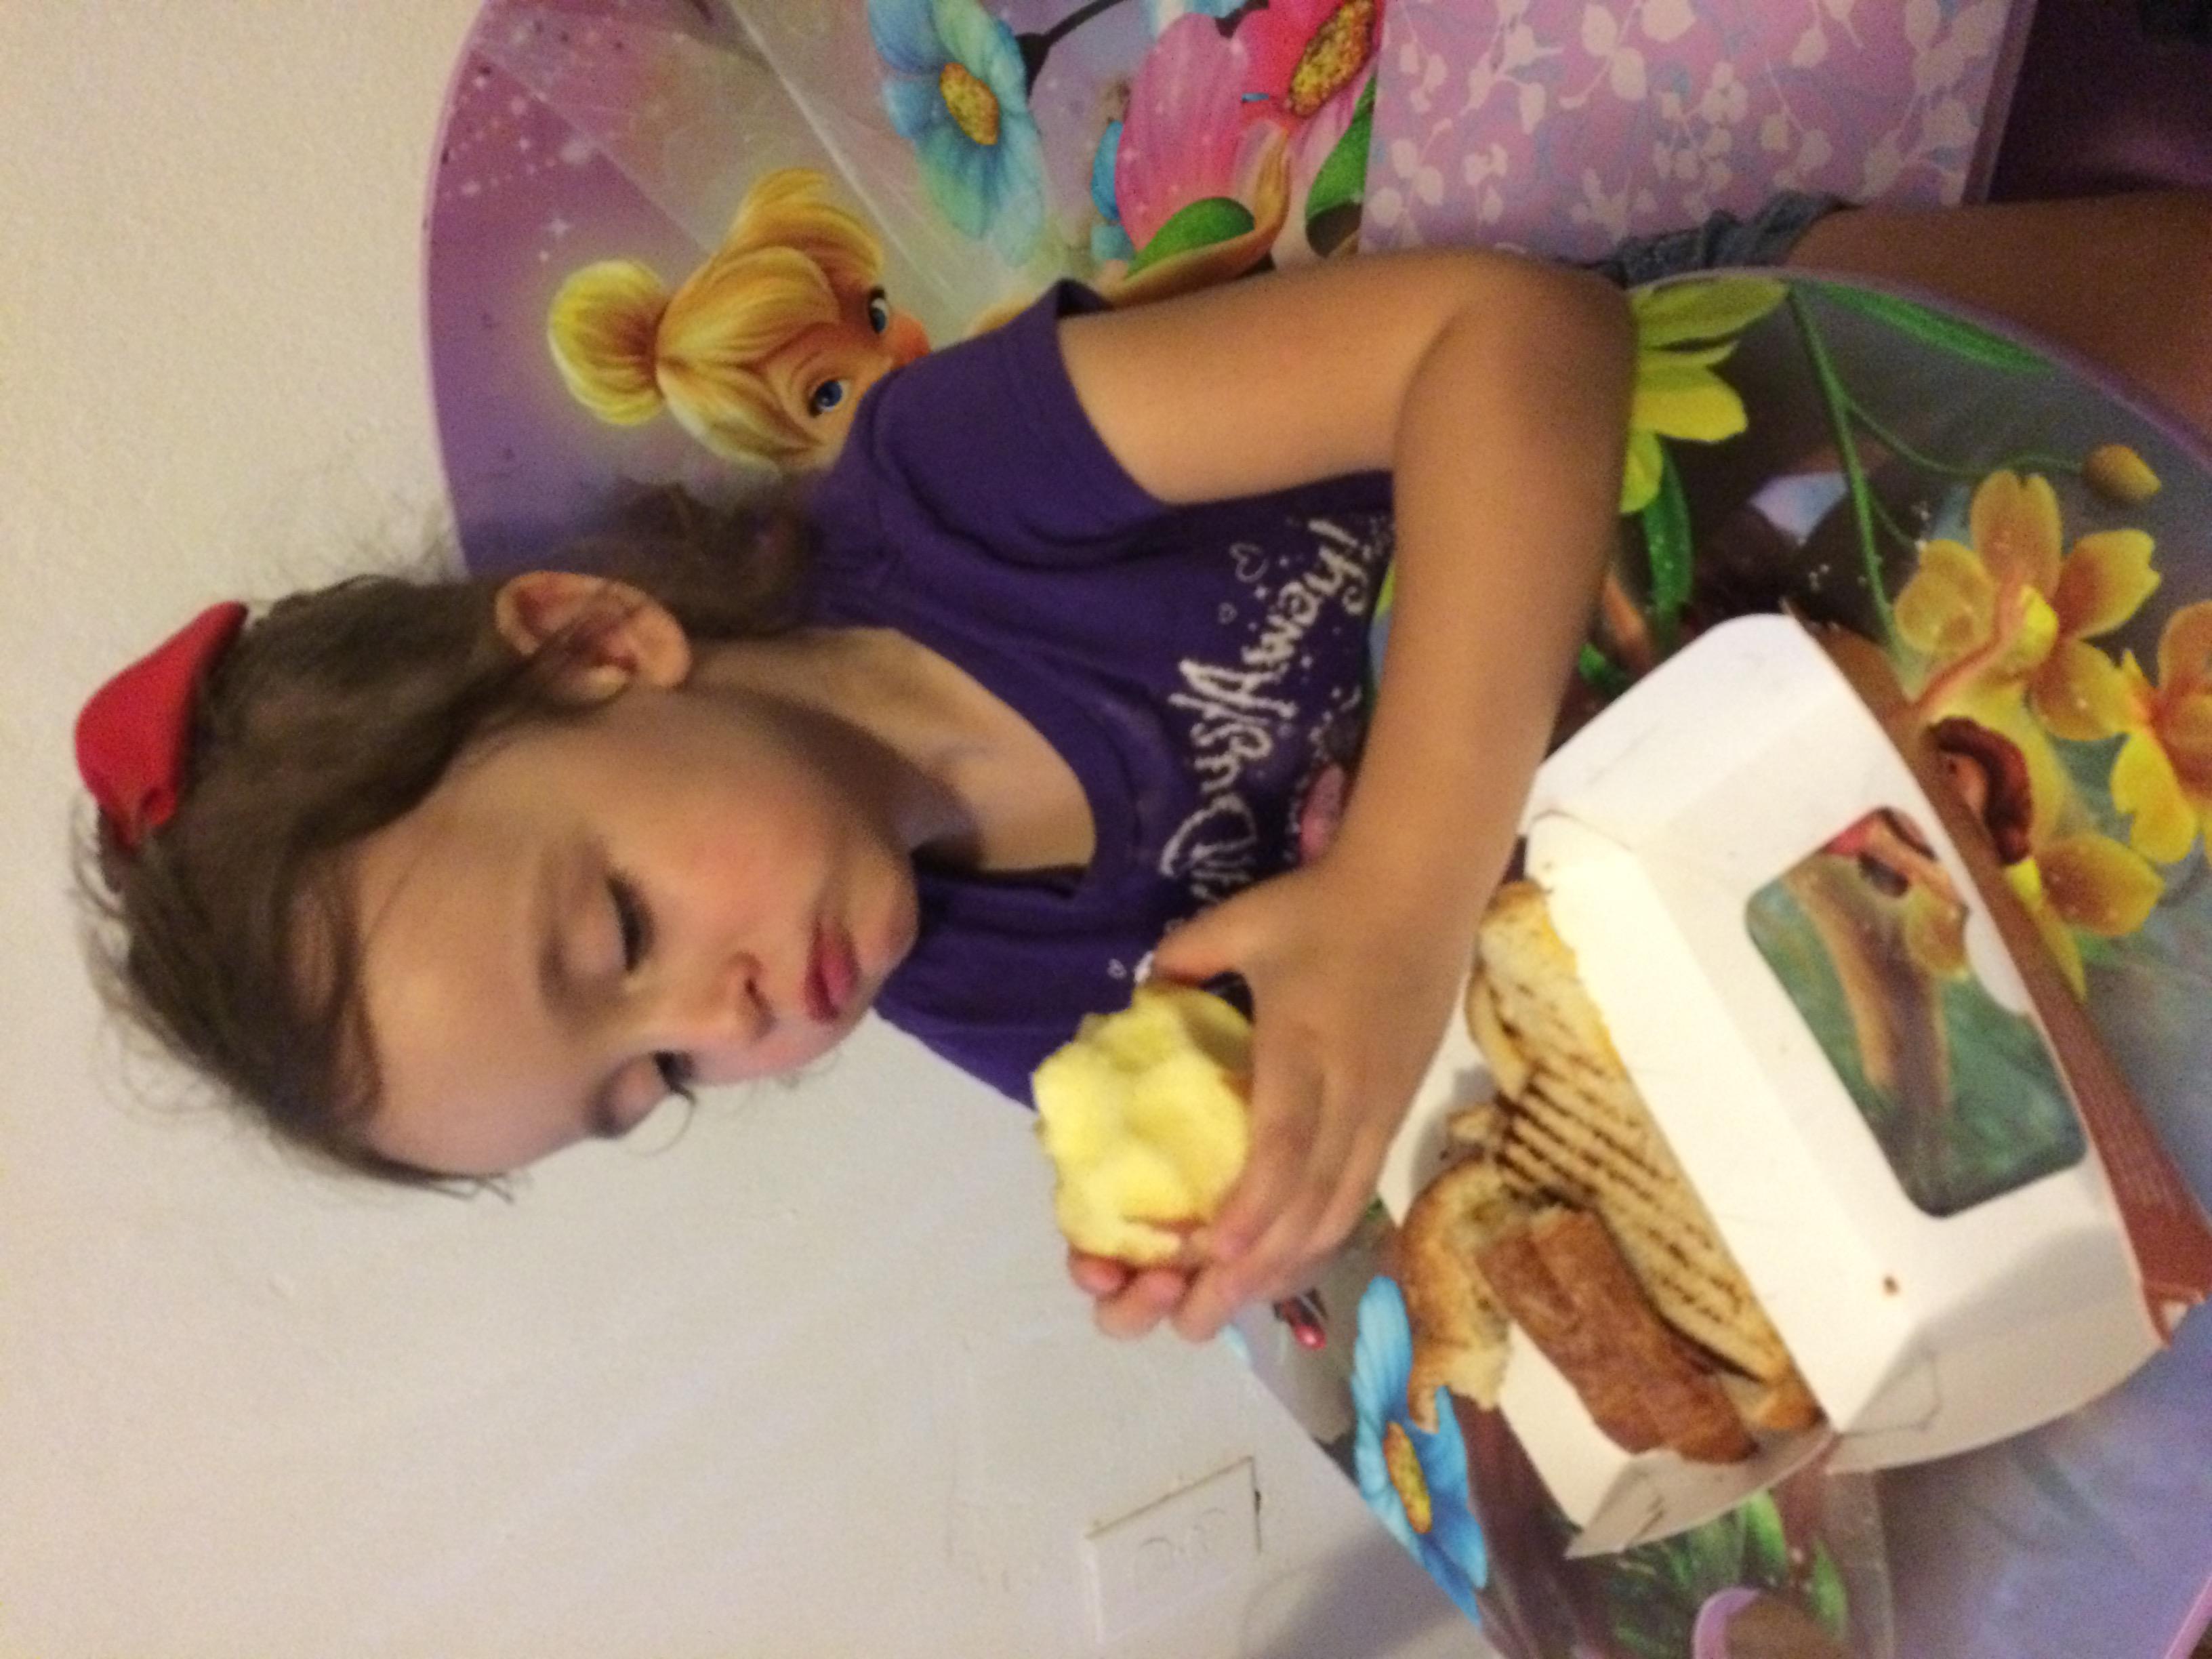 Daphne regarding her apple suspiciously